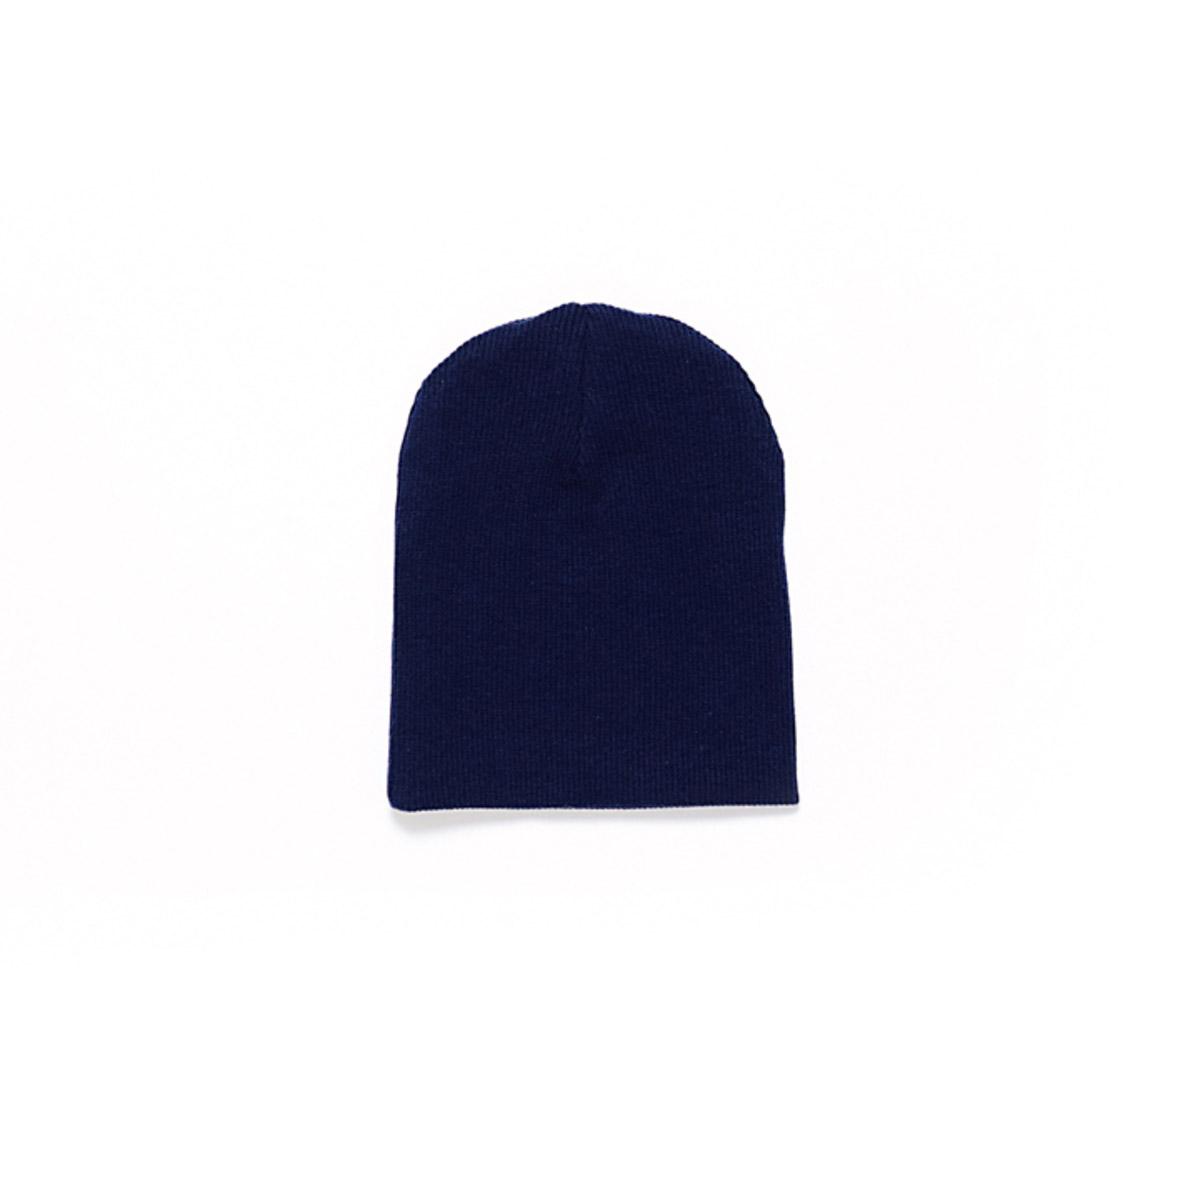 Шапочка Ёмаё (30-02) размер 36 синий